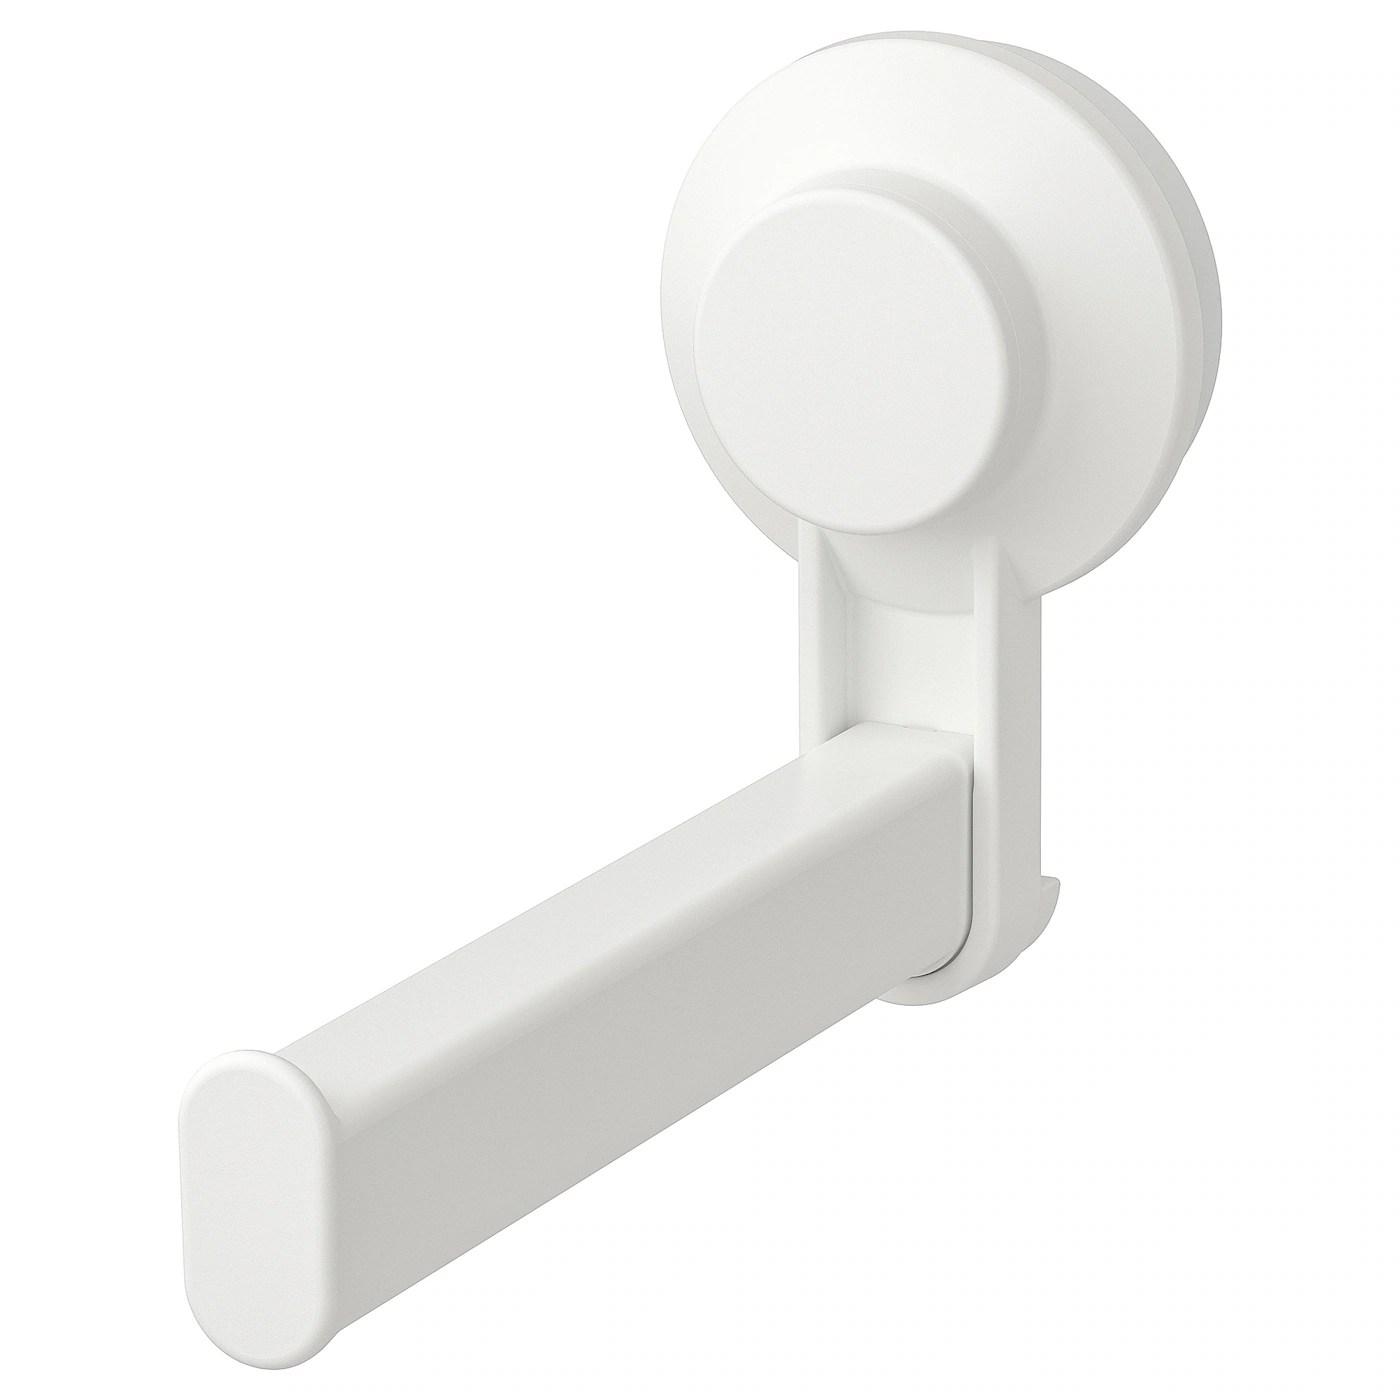 Tisken Support Porte Rouleau Wc A Ventouse Blanc Ikea